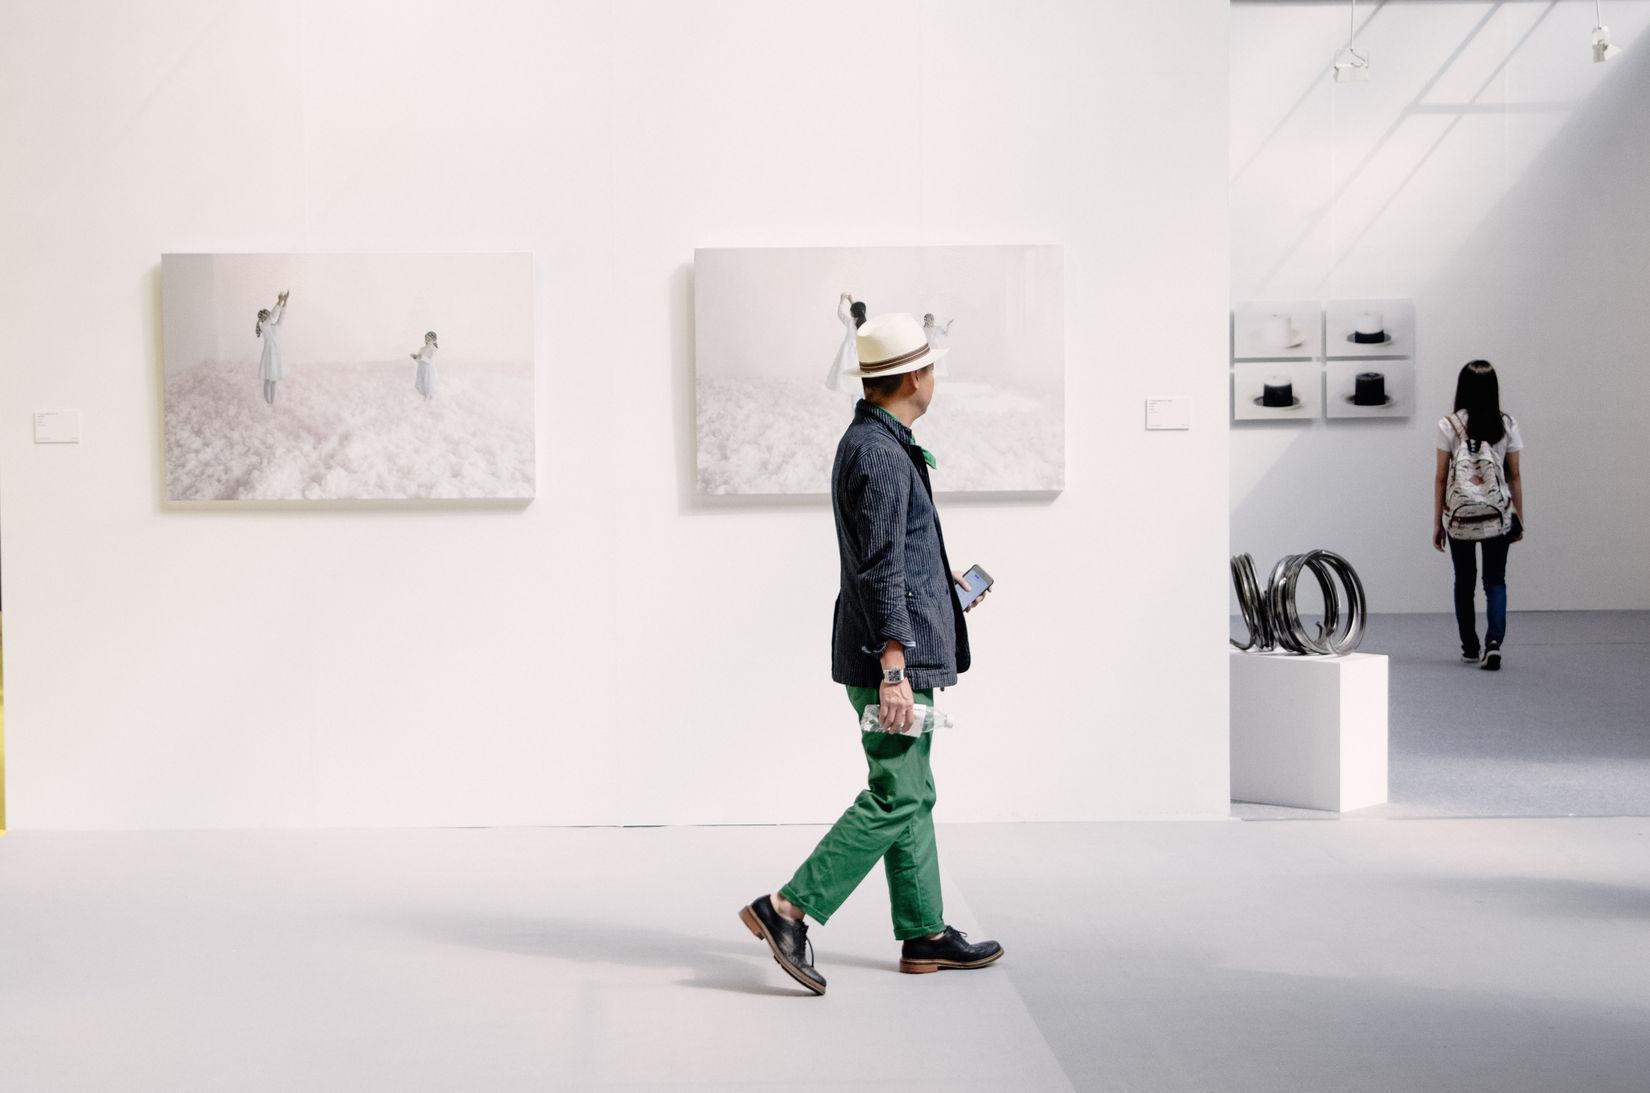 Interview with Emerson Kun-Sheng Wang, Art Taipei's Executive Director